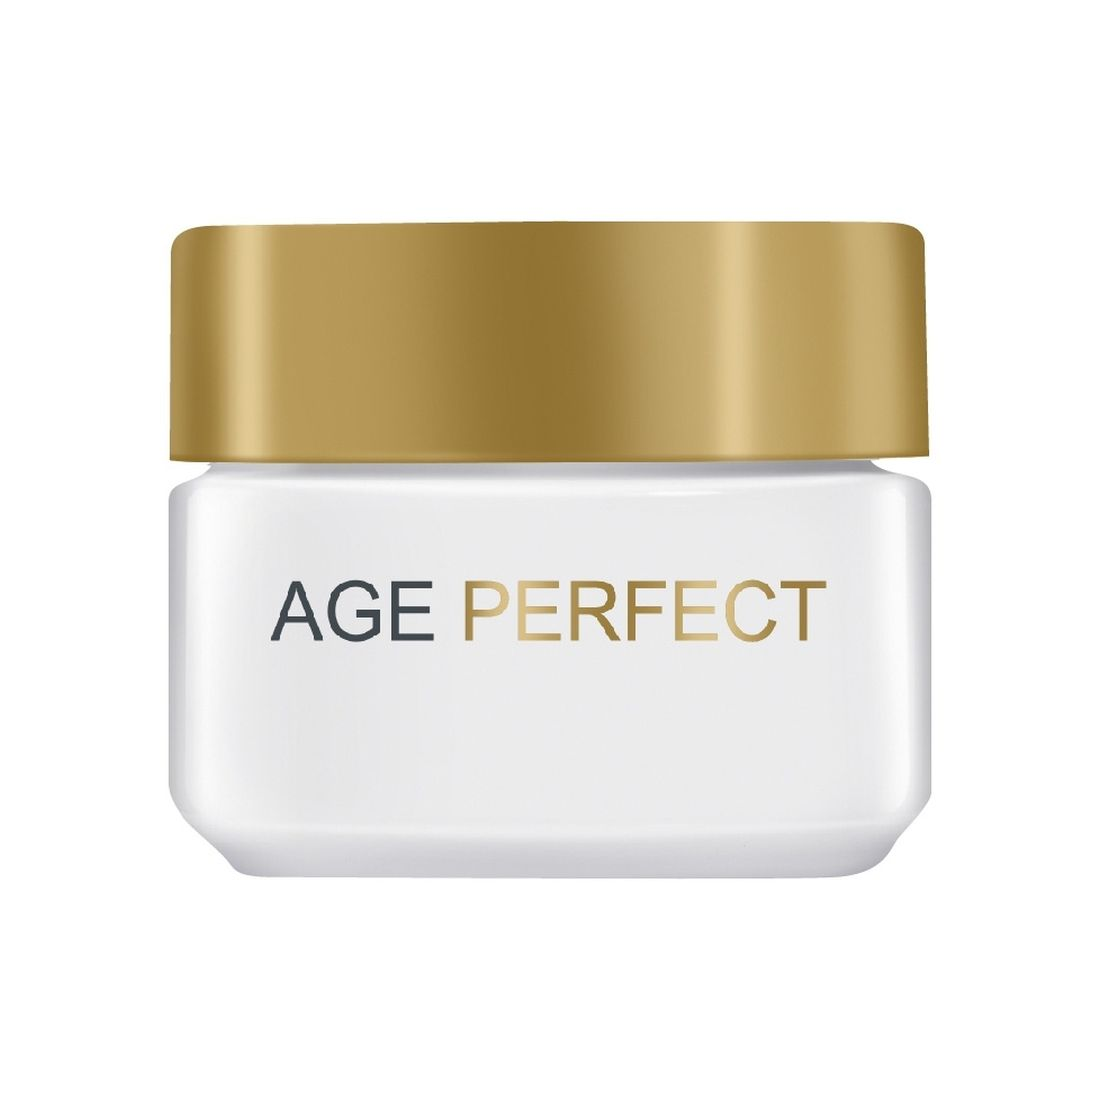 L'Oréal Age Perfect Day Cream 50ml  Τύπος Δέρματος : Όλοι οι τύποι